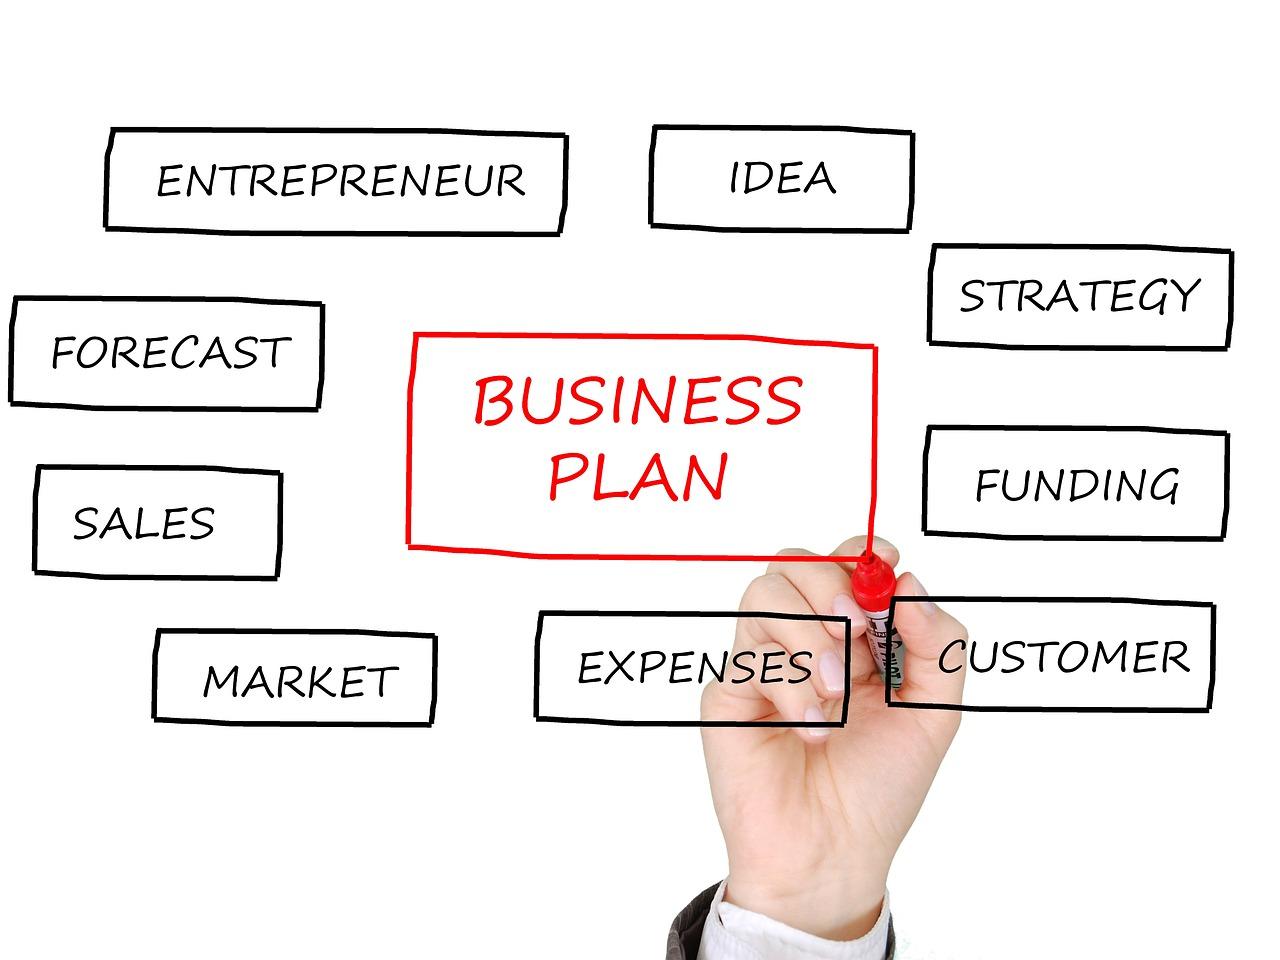 Innovative Business Ideas for Entrepreneurs in Portland, Oregon